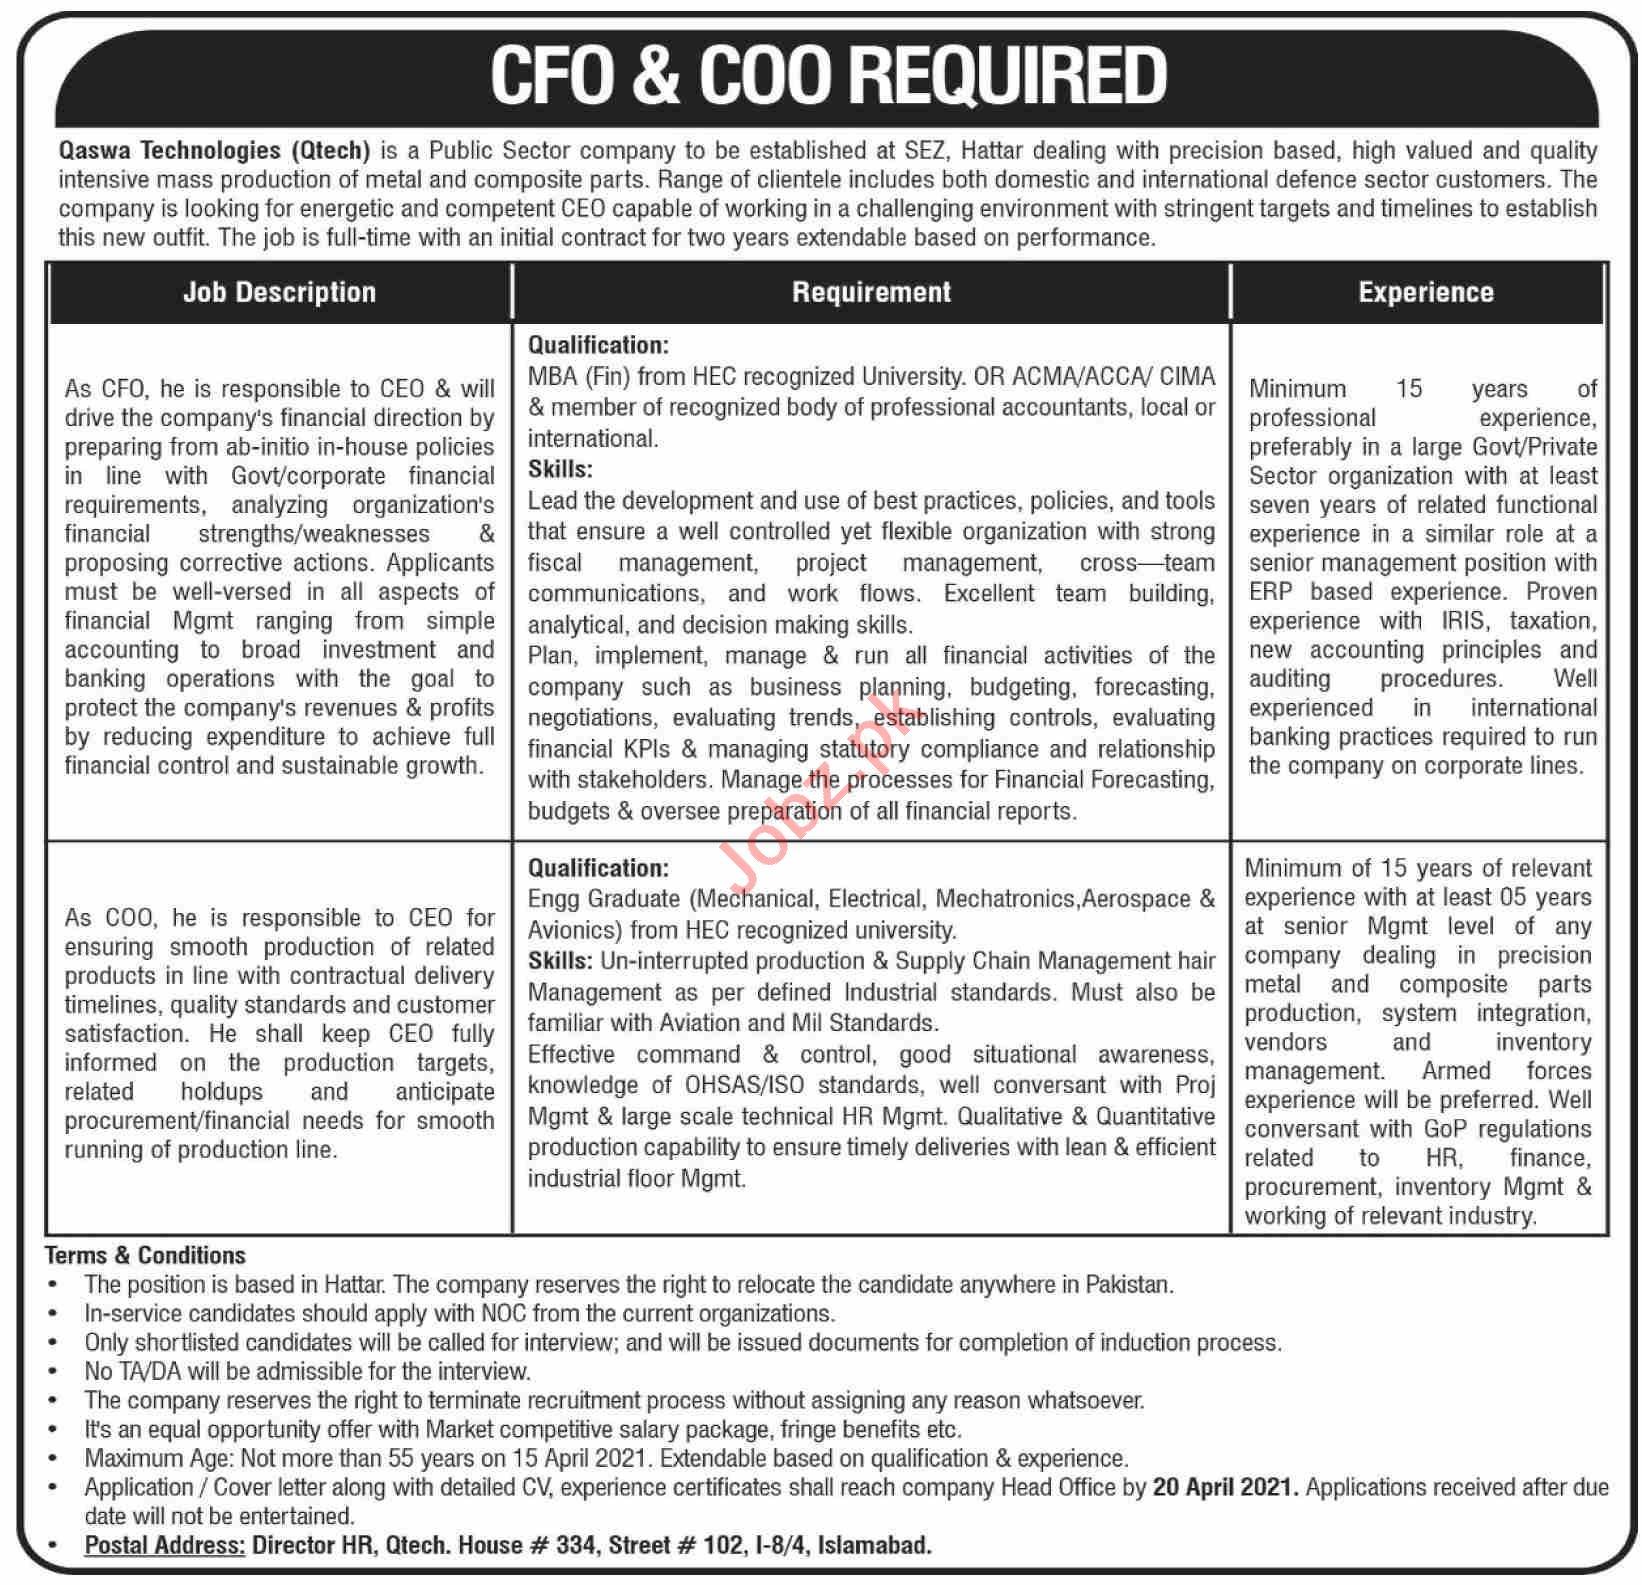 Qaswa Technologies Islamabad Jobs 2021 for CFO & COO